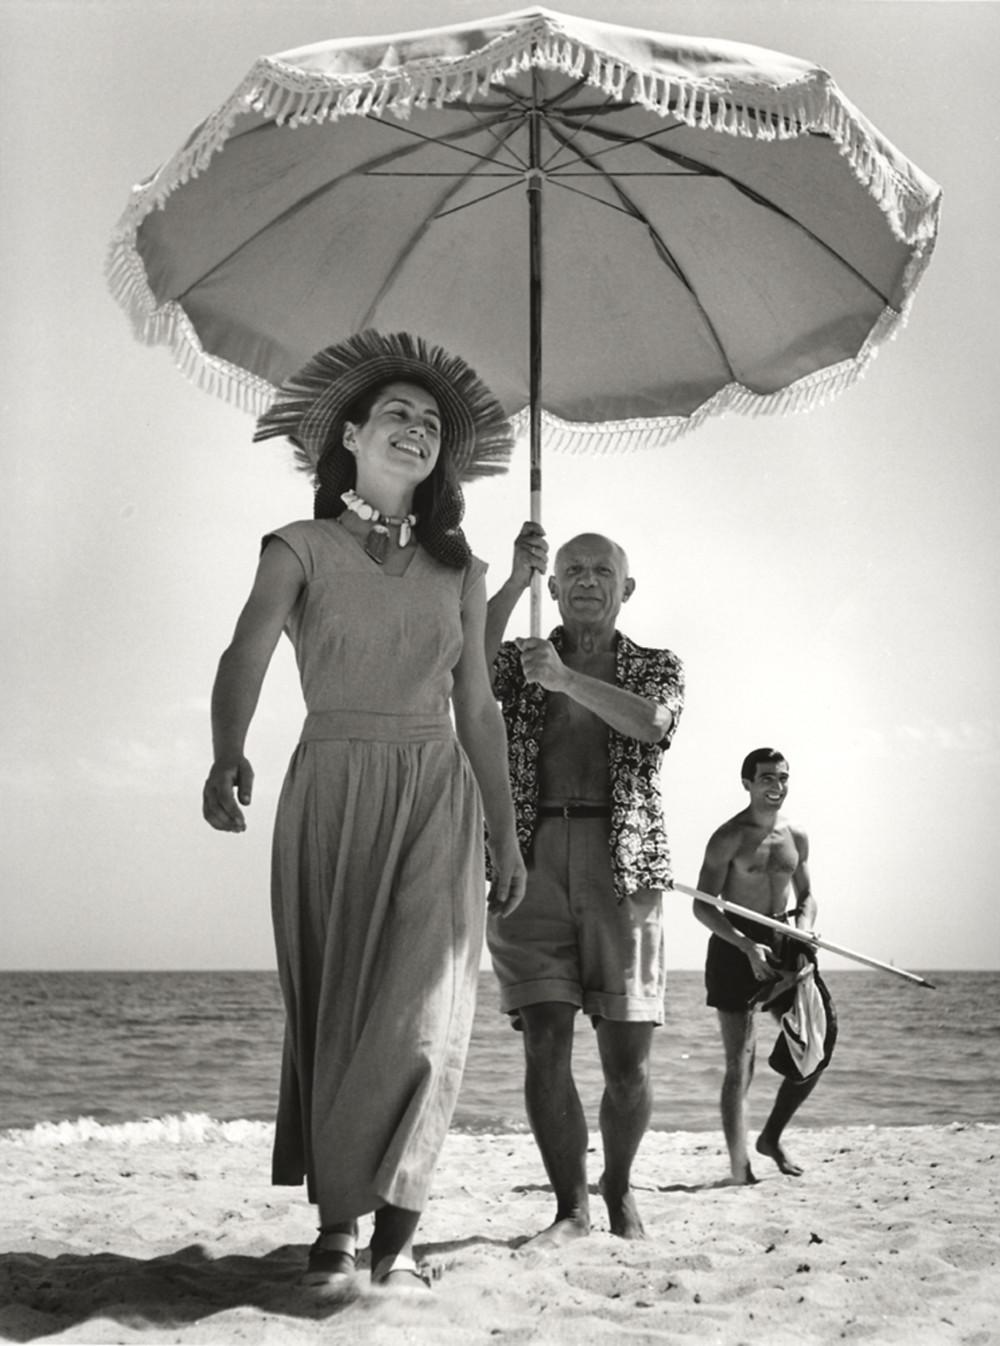 Picasso Robert Capa foto